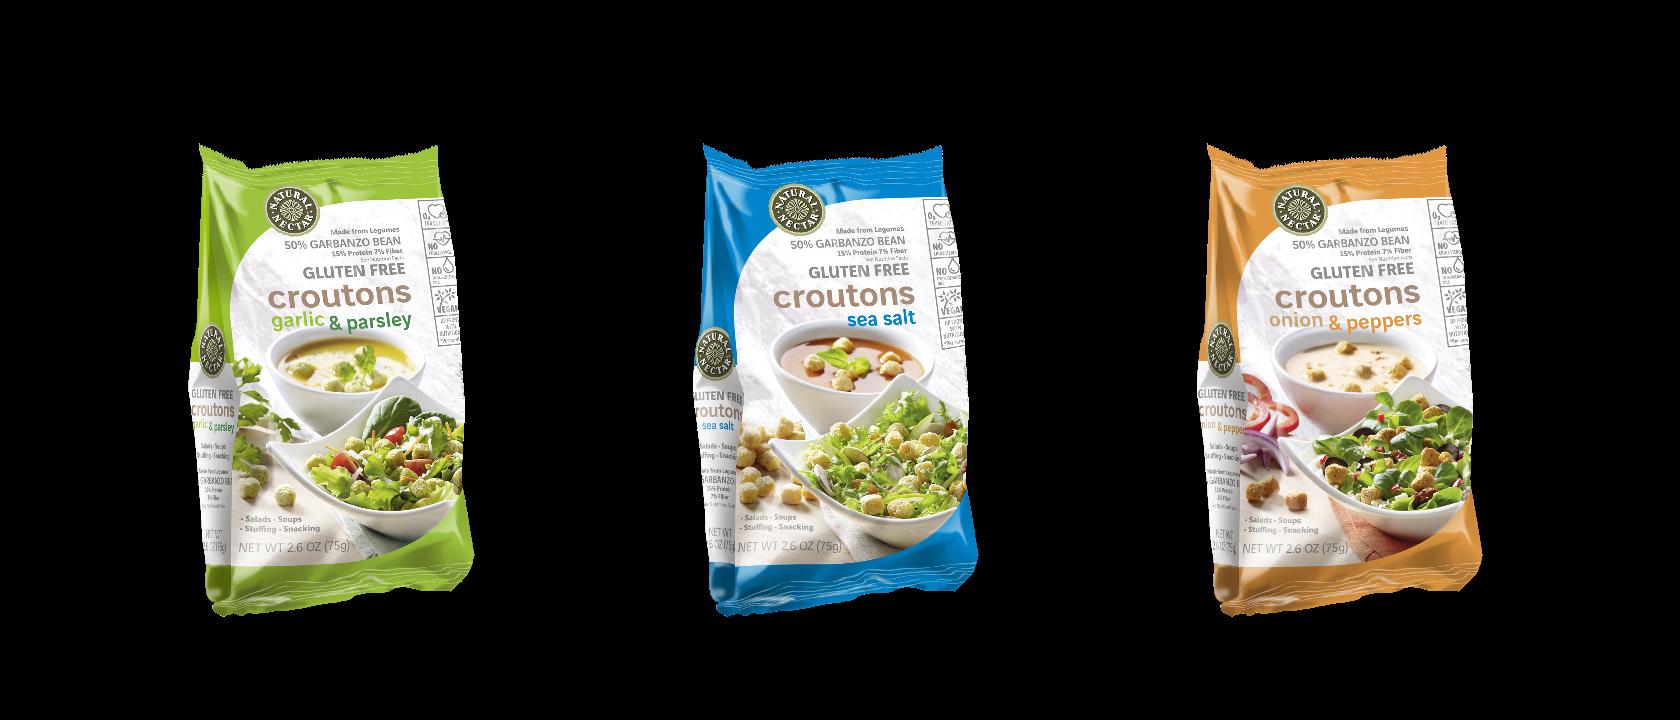 Gluten-Free Croutons